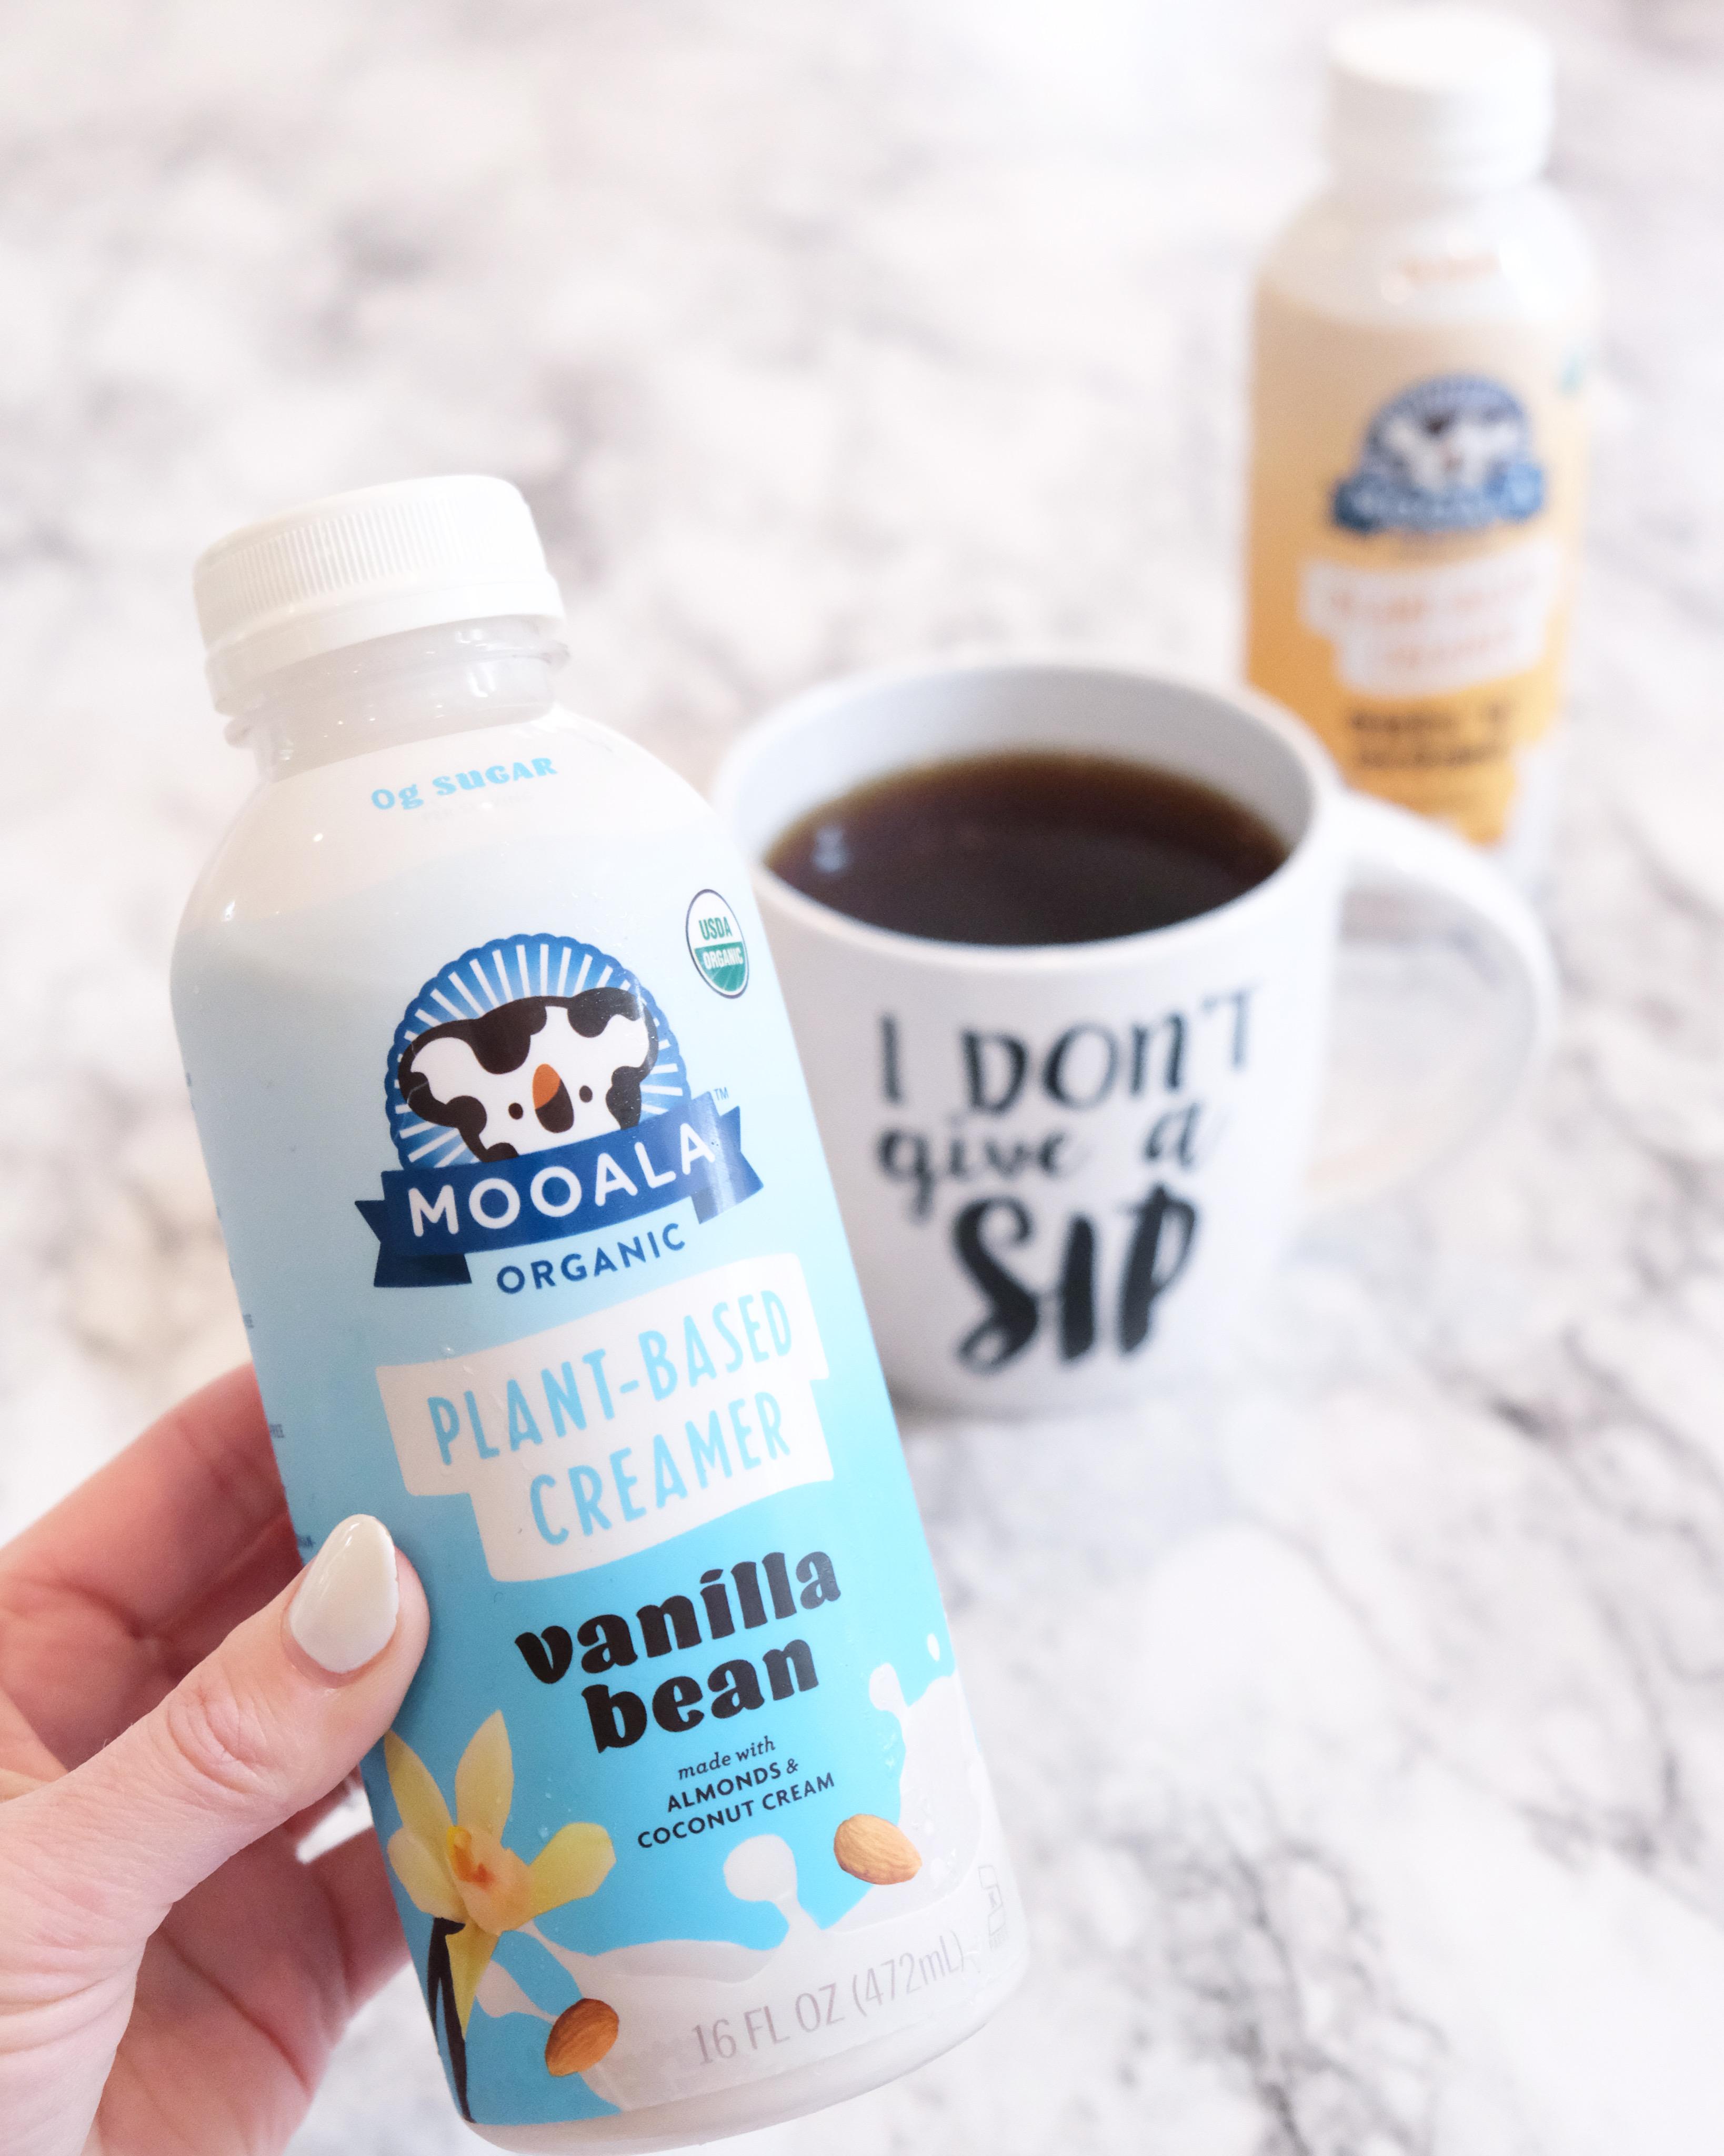 mooala organic plant-based creamer and milk